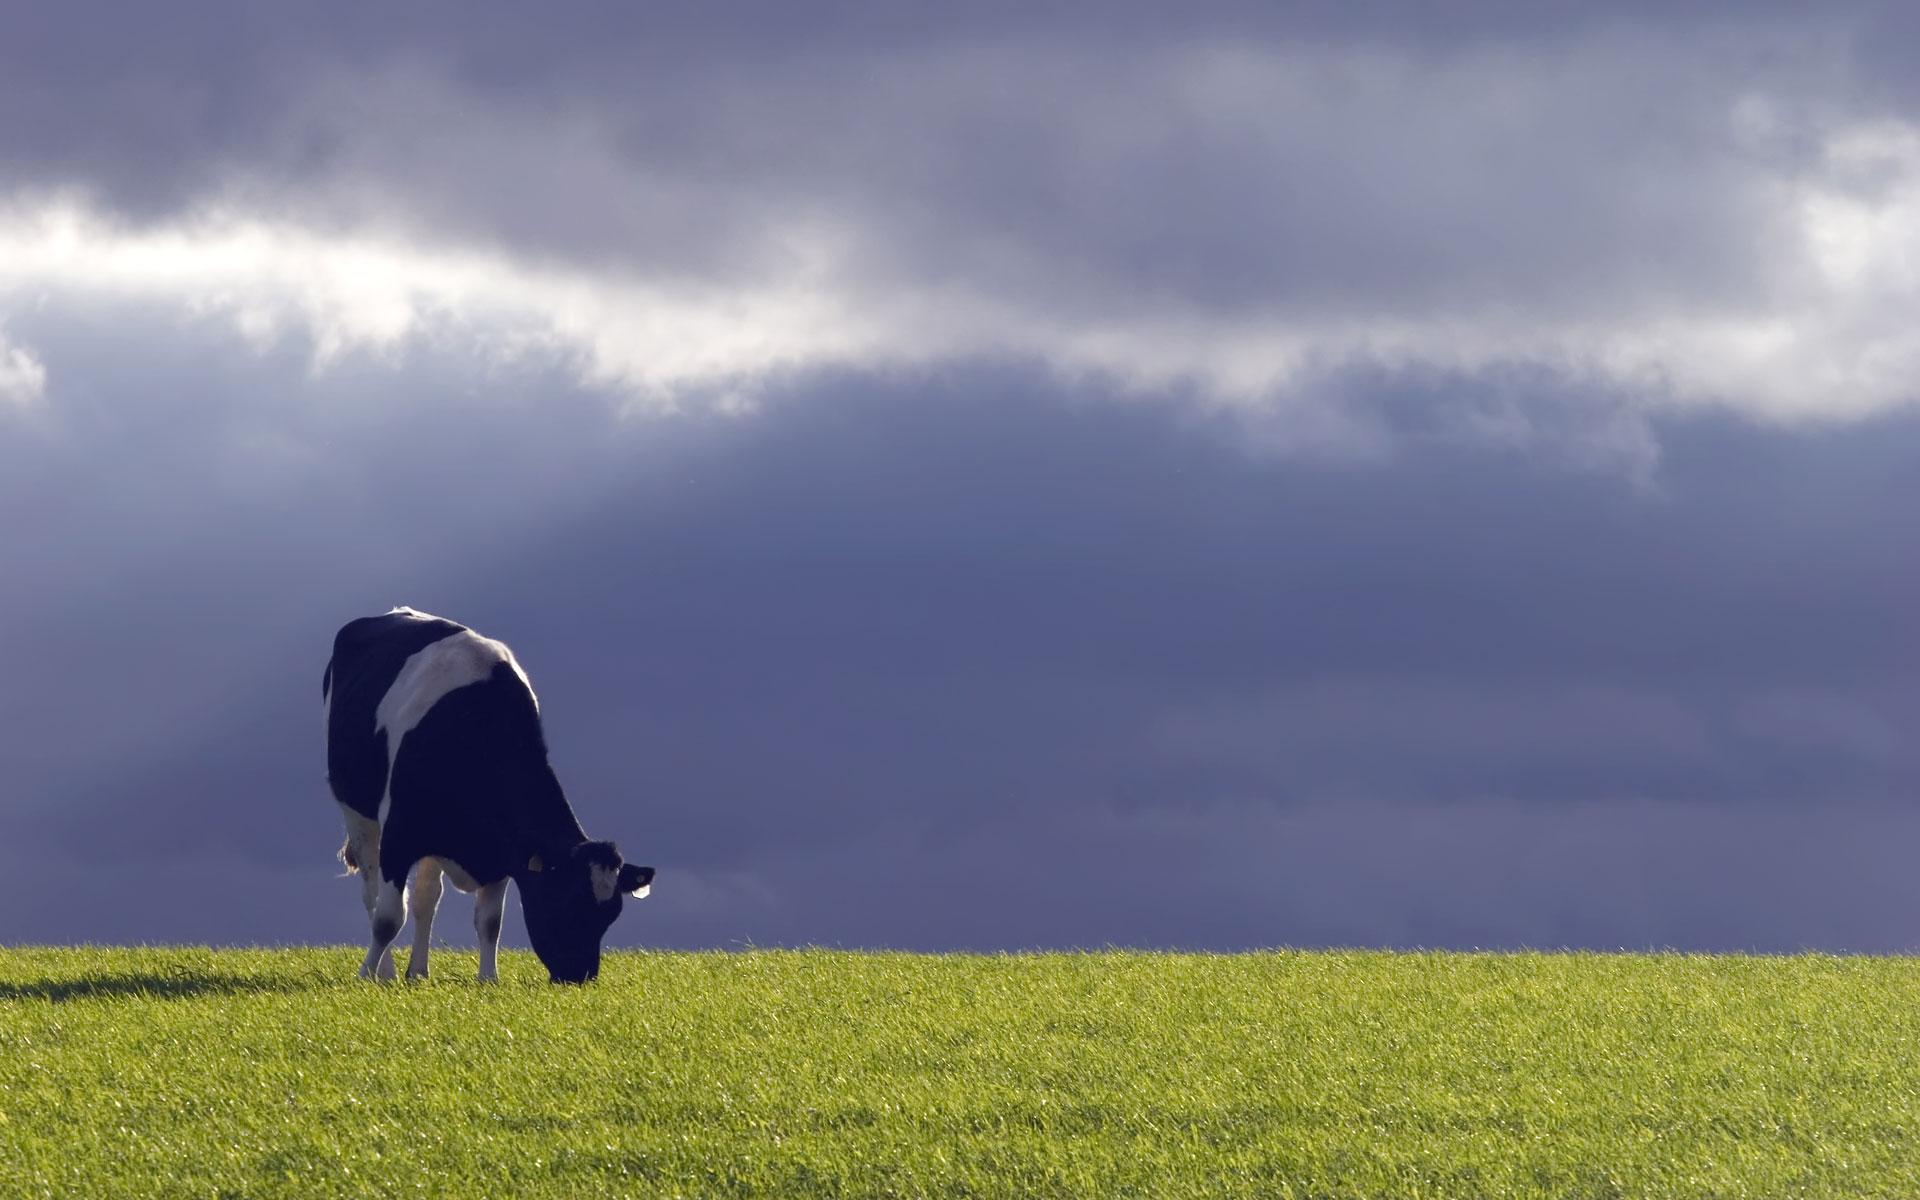 cow grazing desktop wallpaper 51978 1920x1200 px